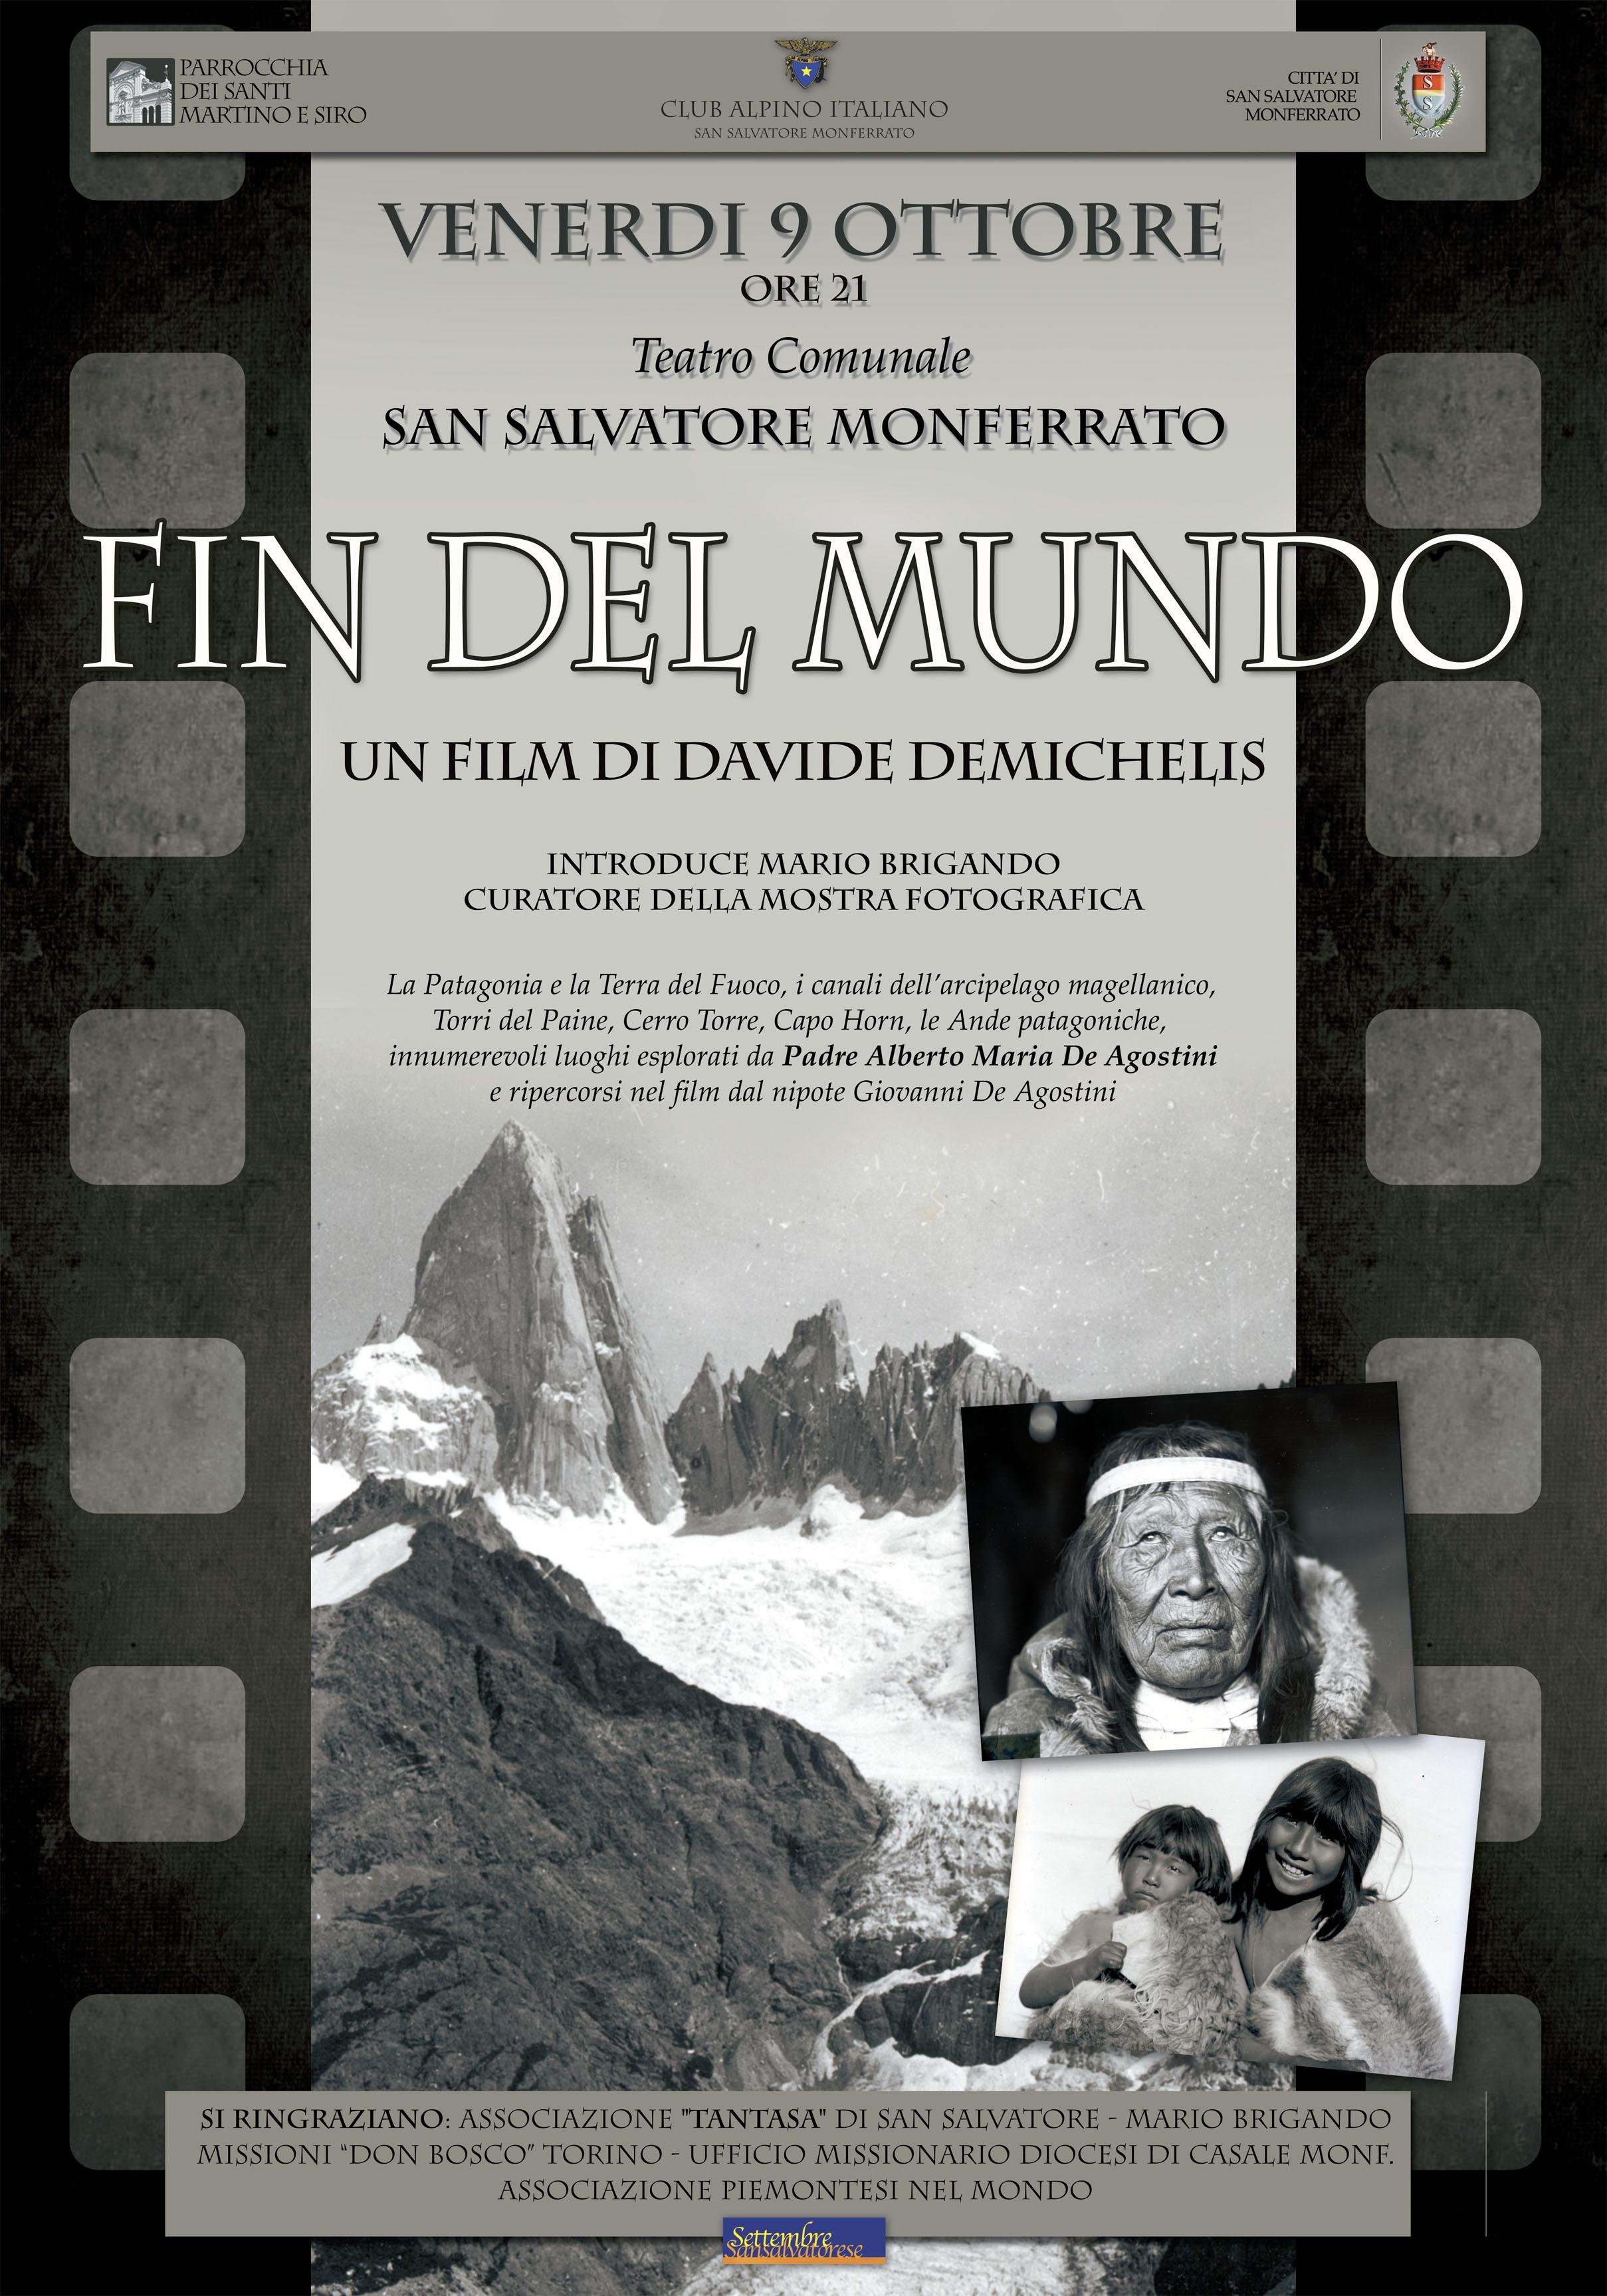 FINDELMUNDO.eps